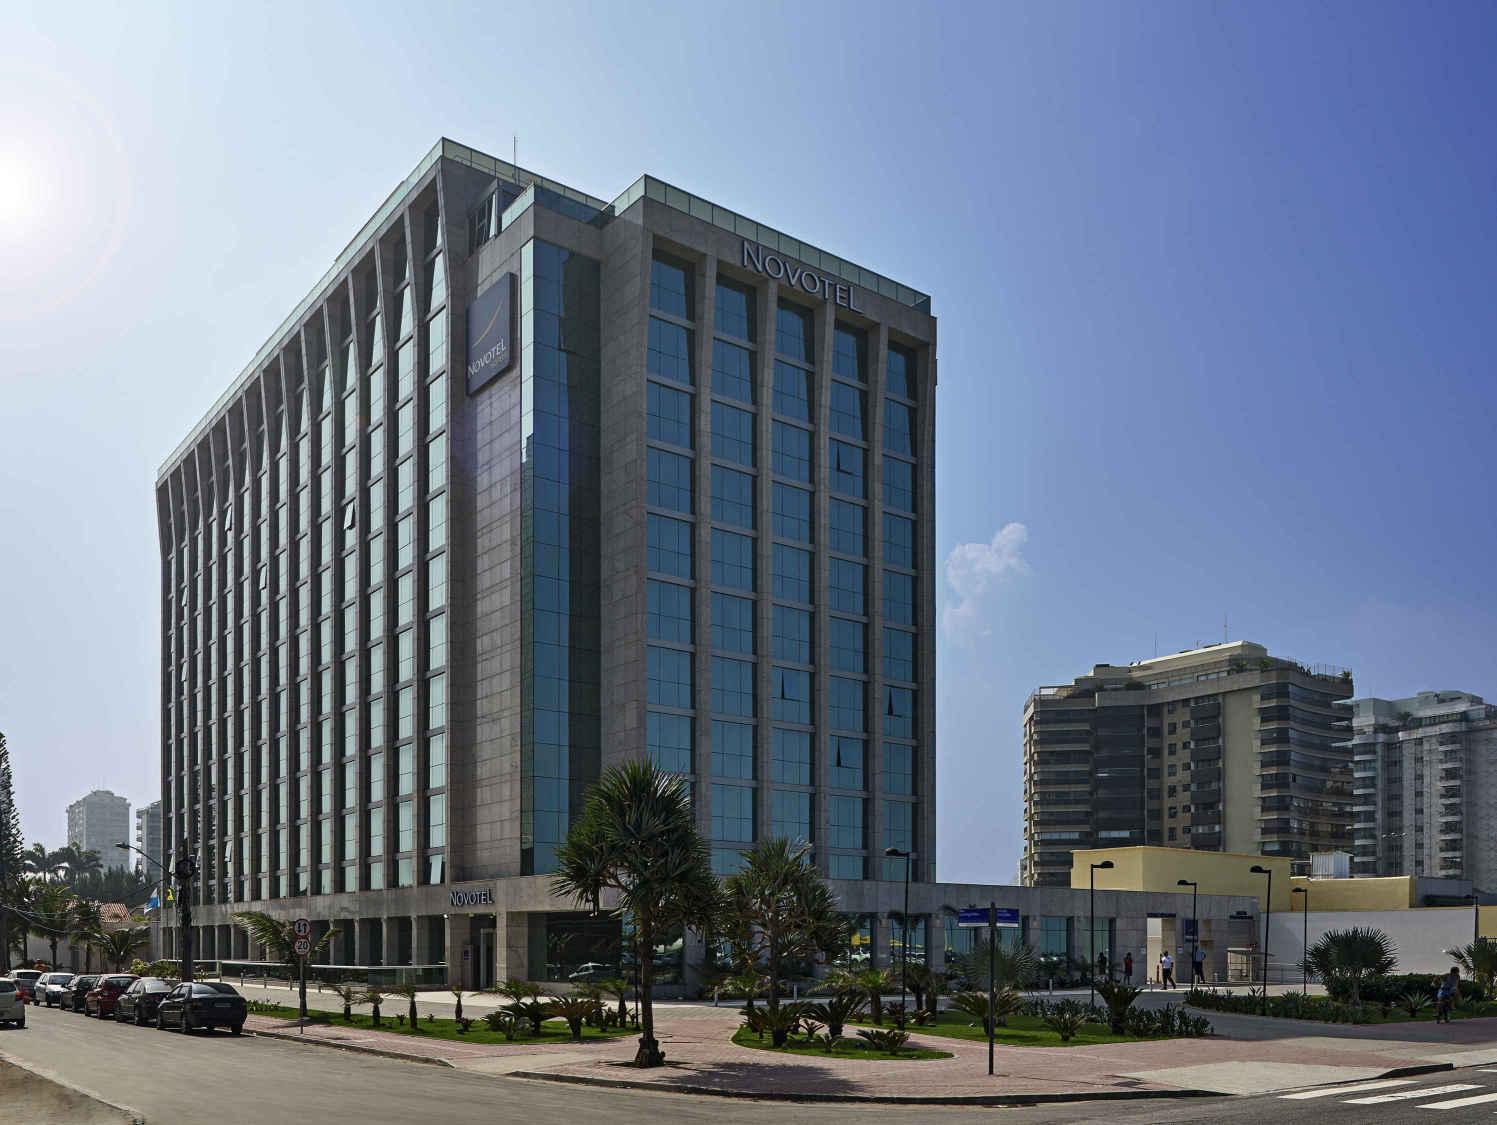 HotelNovotel Rio De Janeiro Barra Da Tijuca